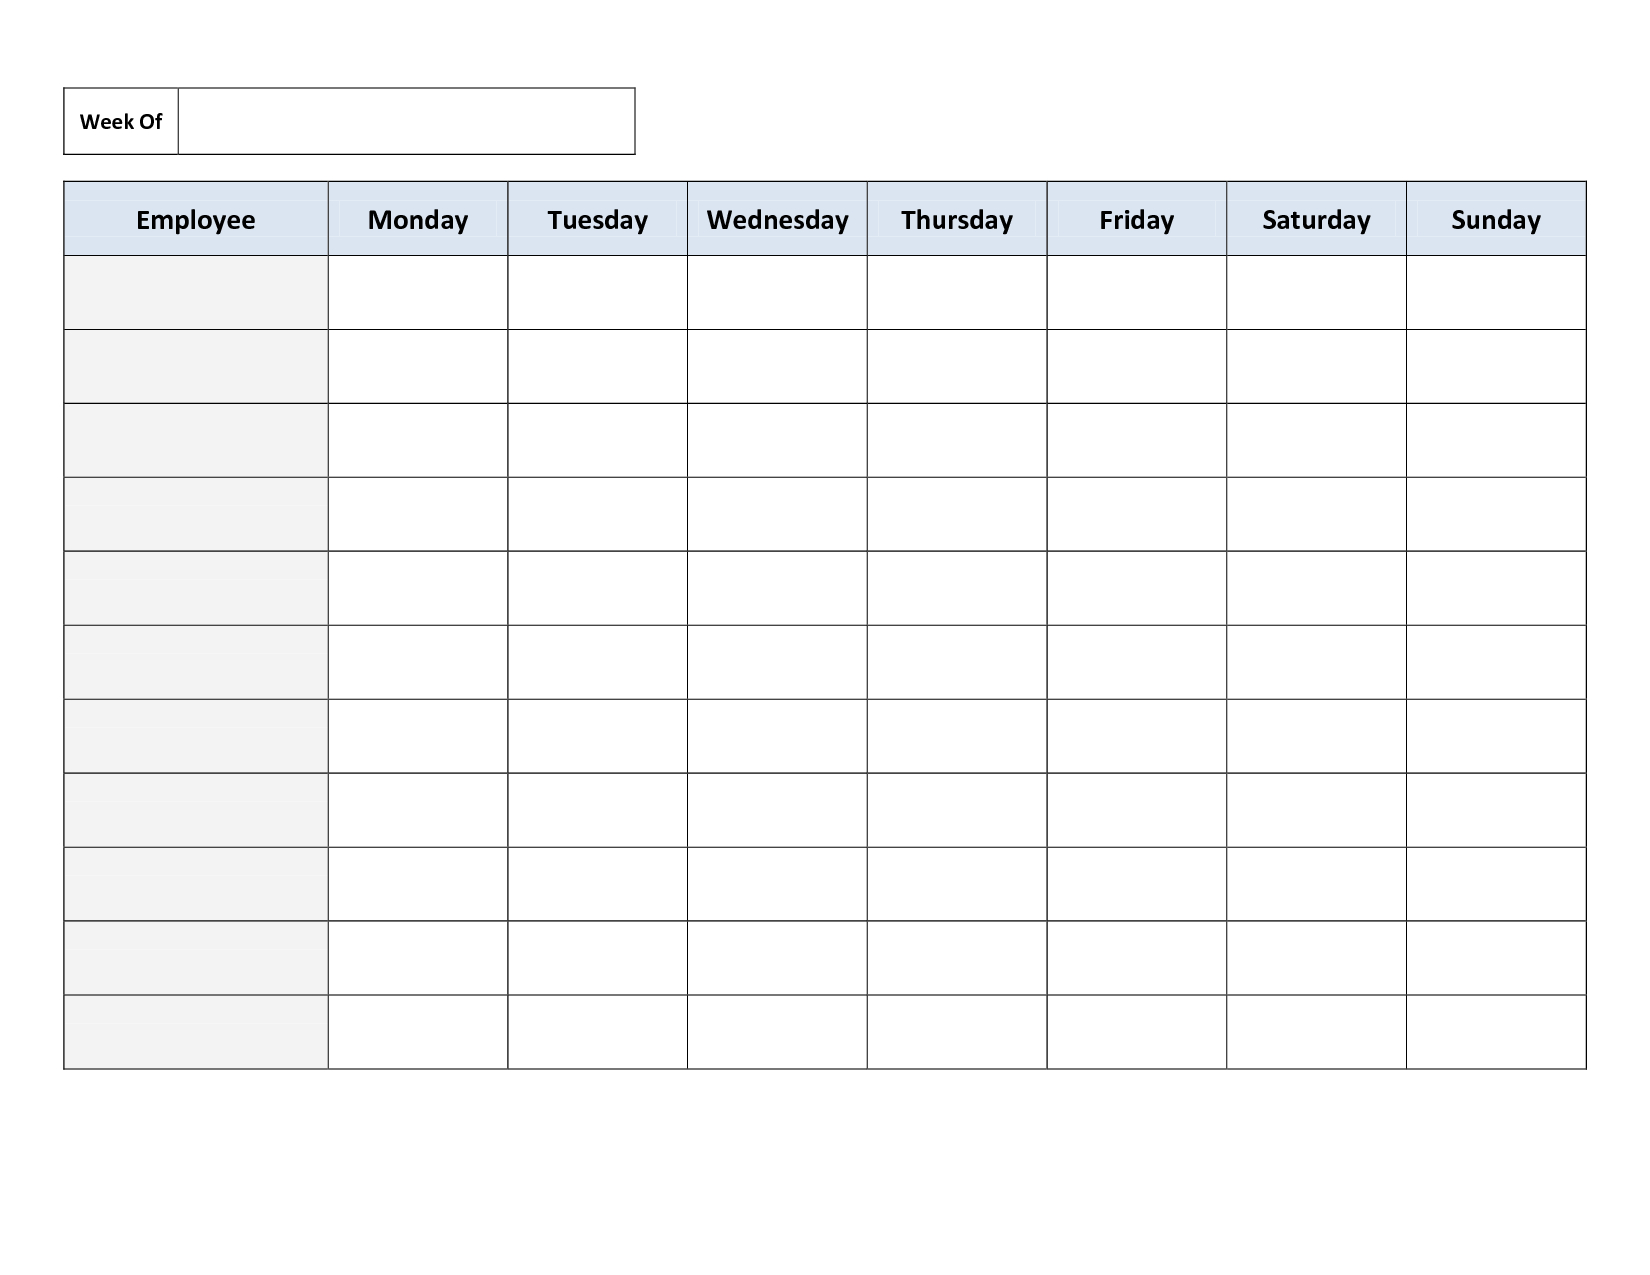 Weekly Employee Work Schedule Template. Free Blank Schedule.pdf - Free Printable Blank Weekly Schedule